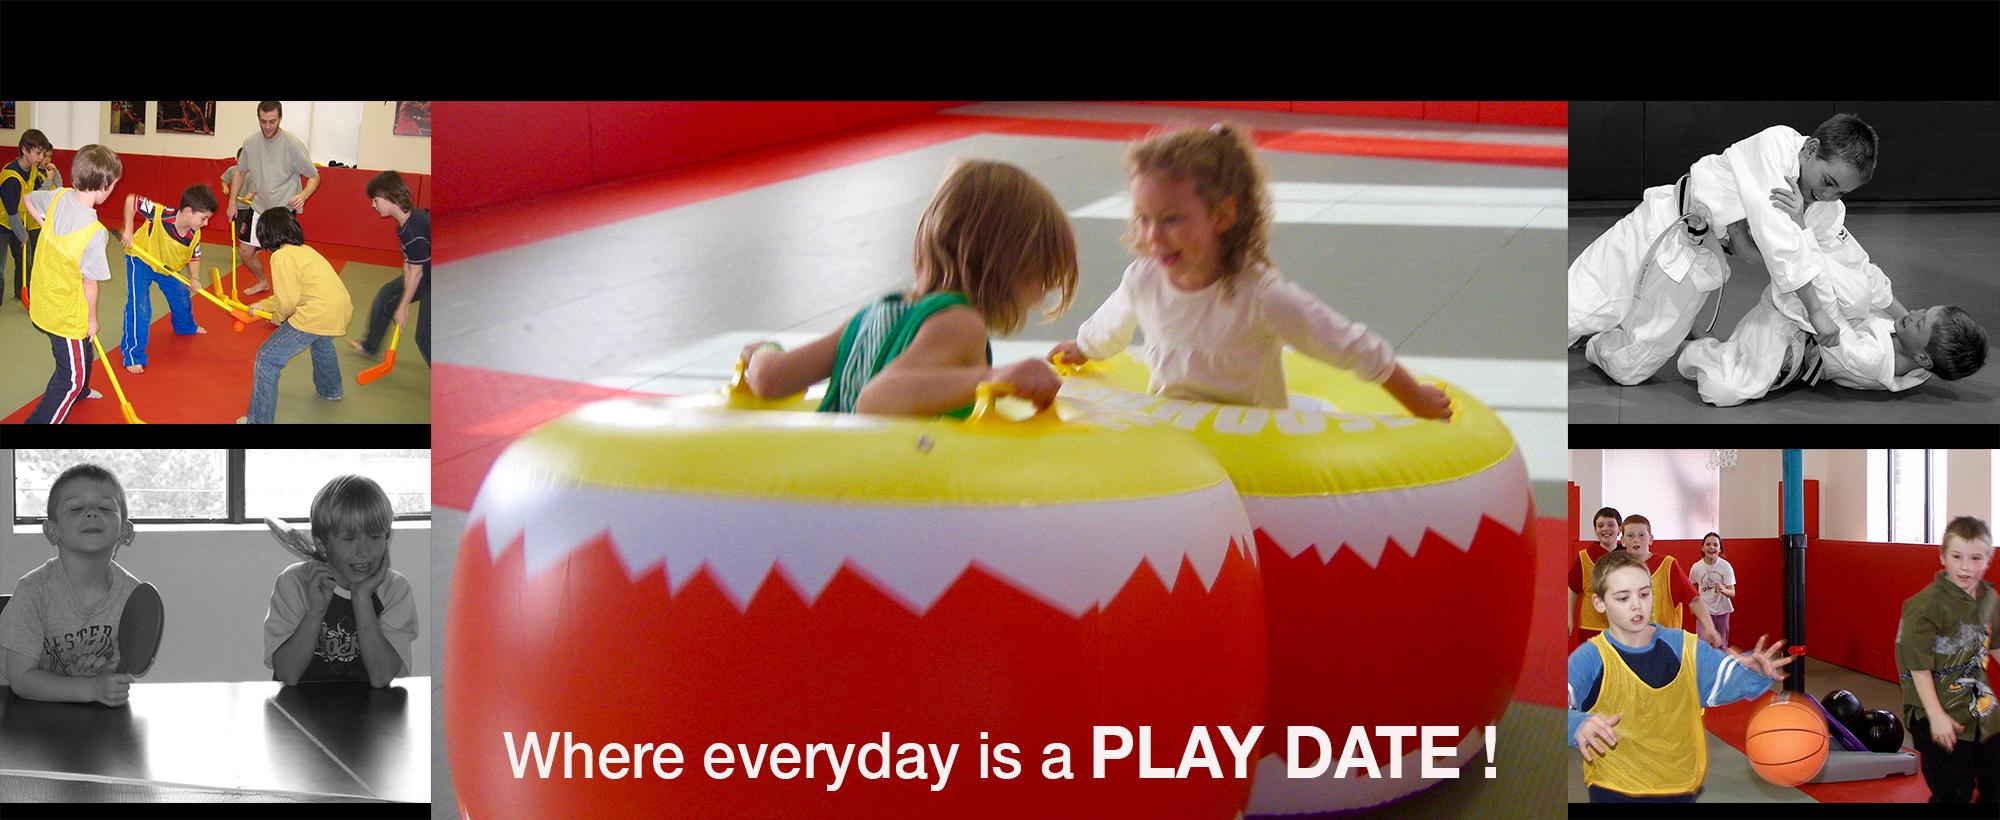 100 Play Datenew1